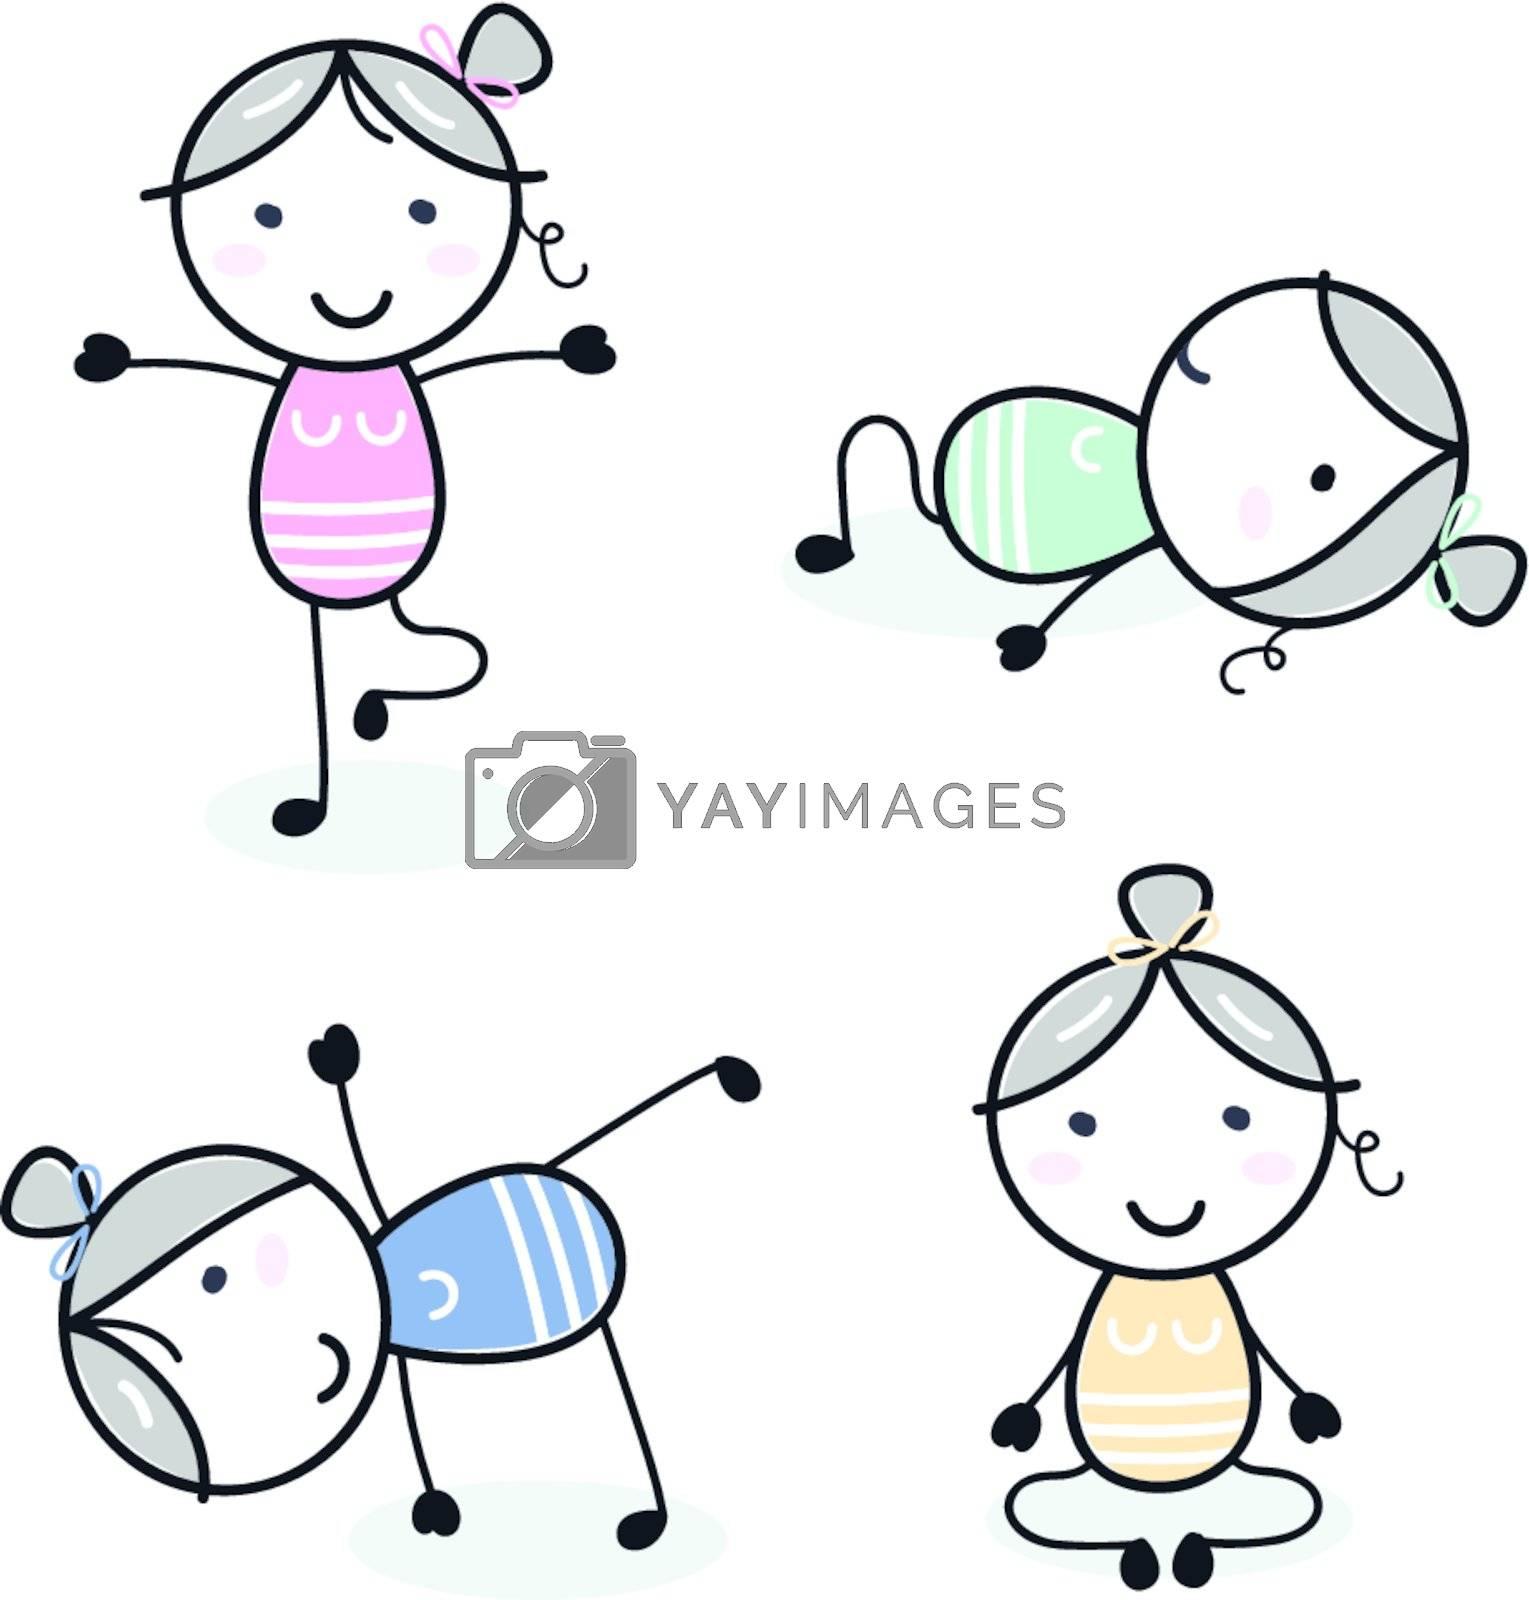 Retro women in doodle style practicing yoga. Vector